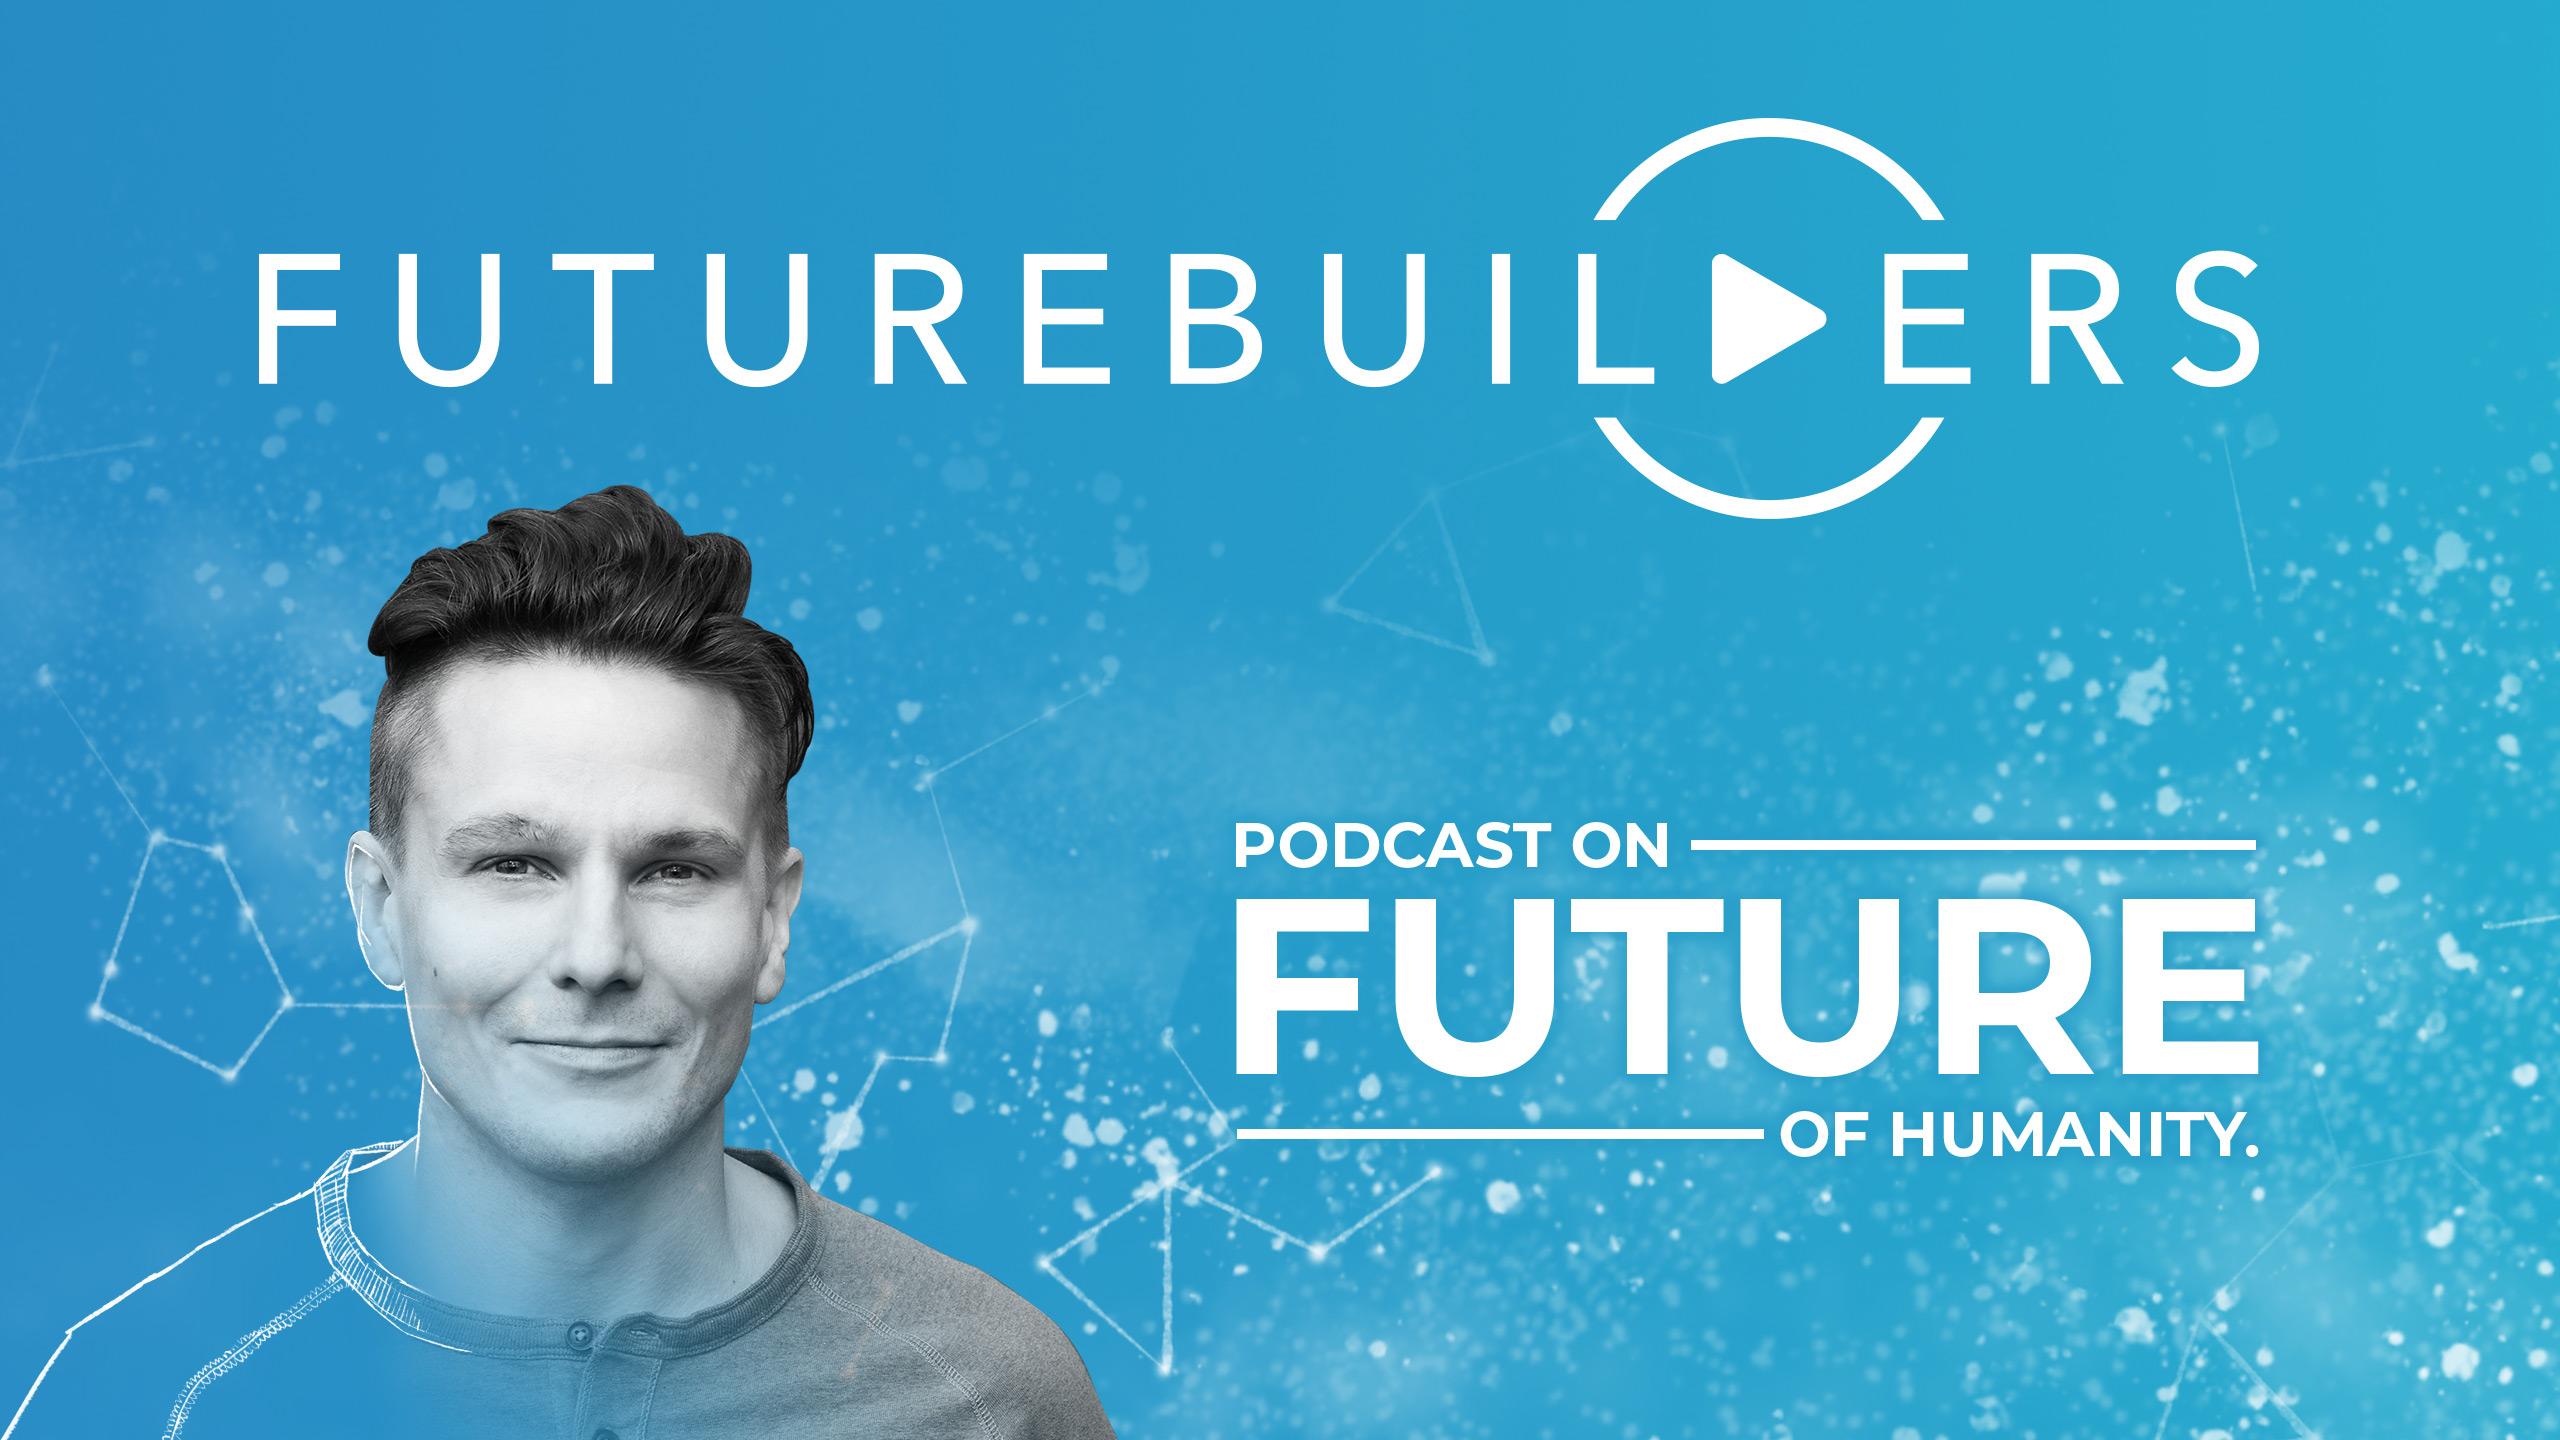 Futurebuilders podcast show